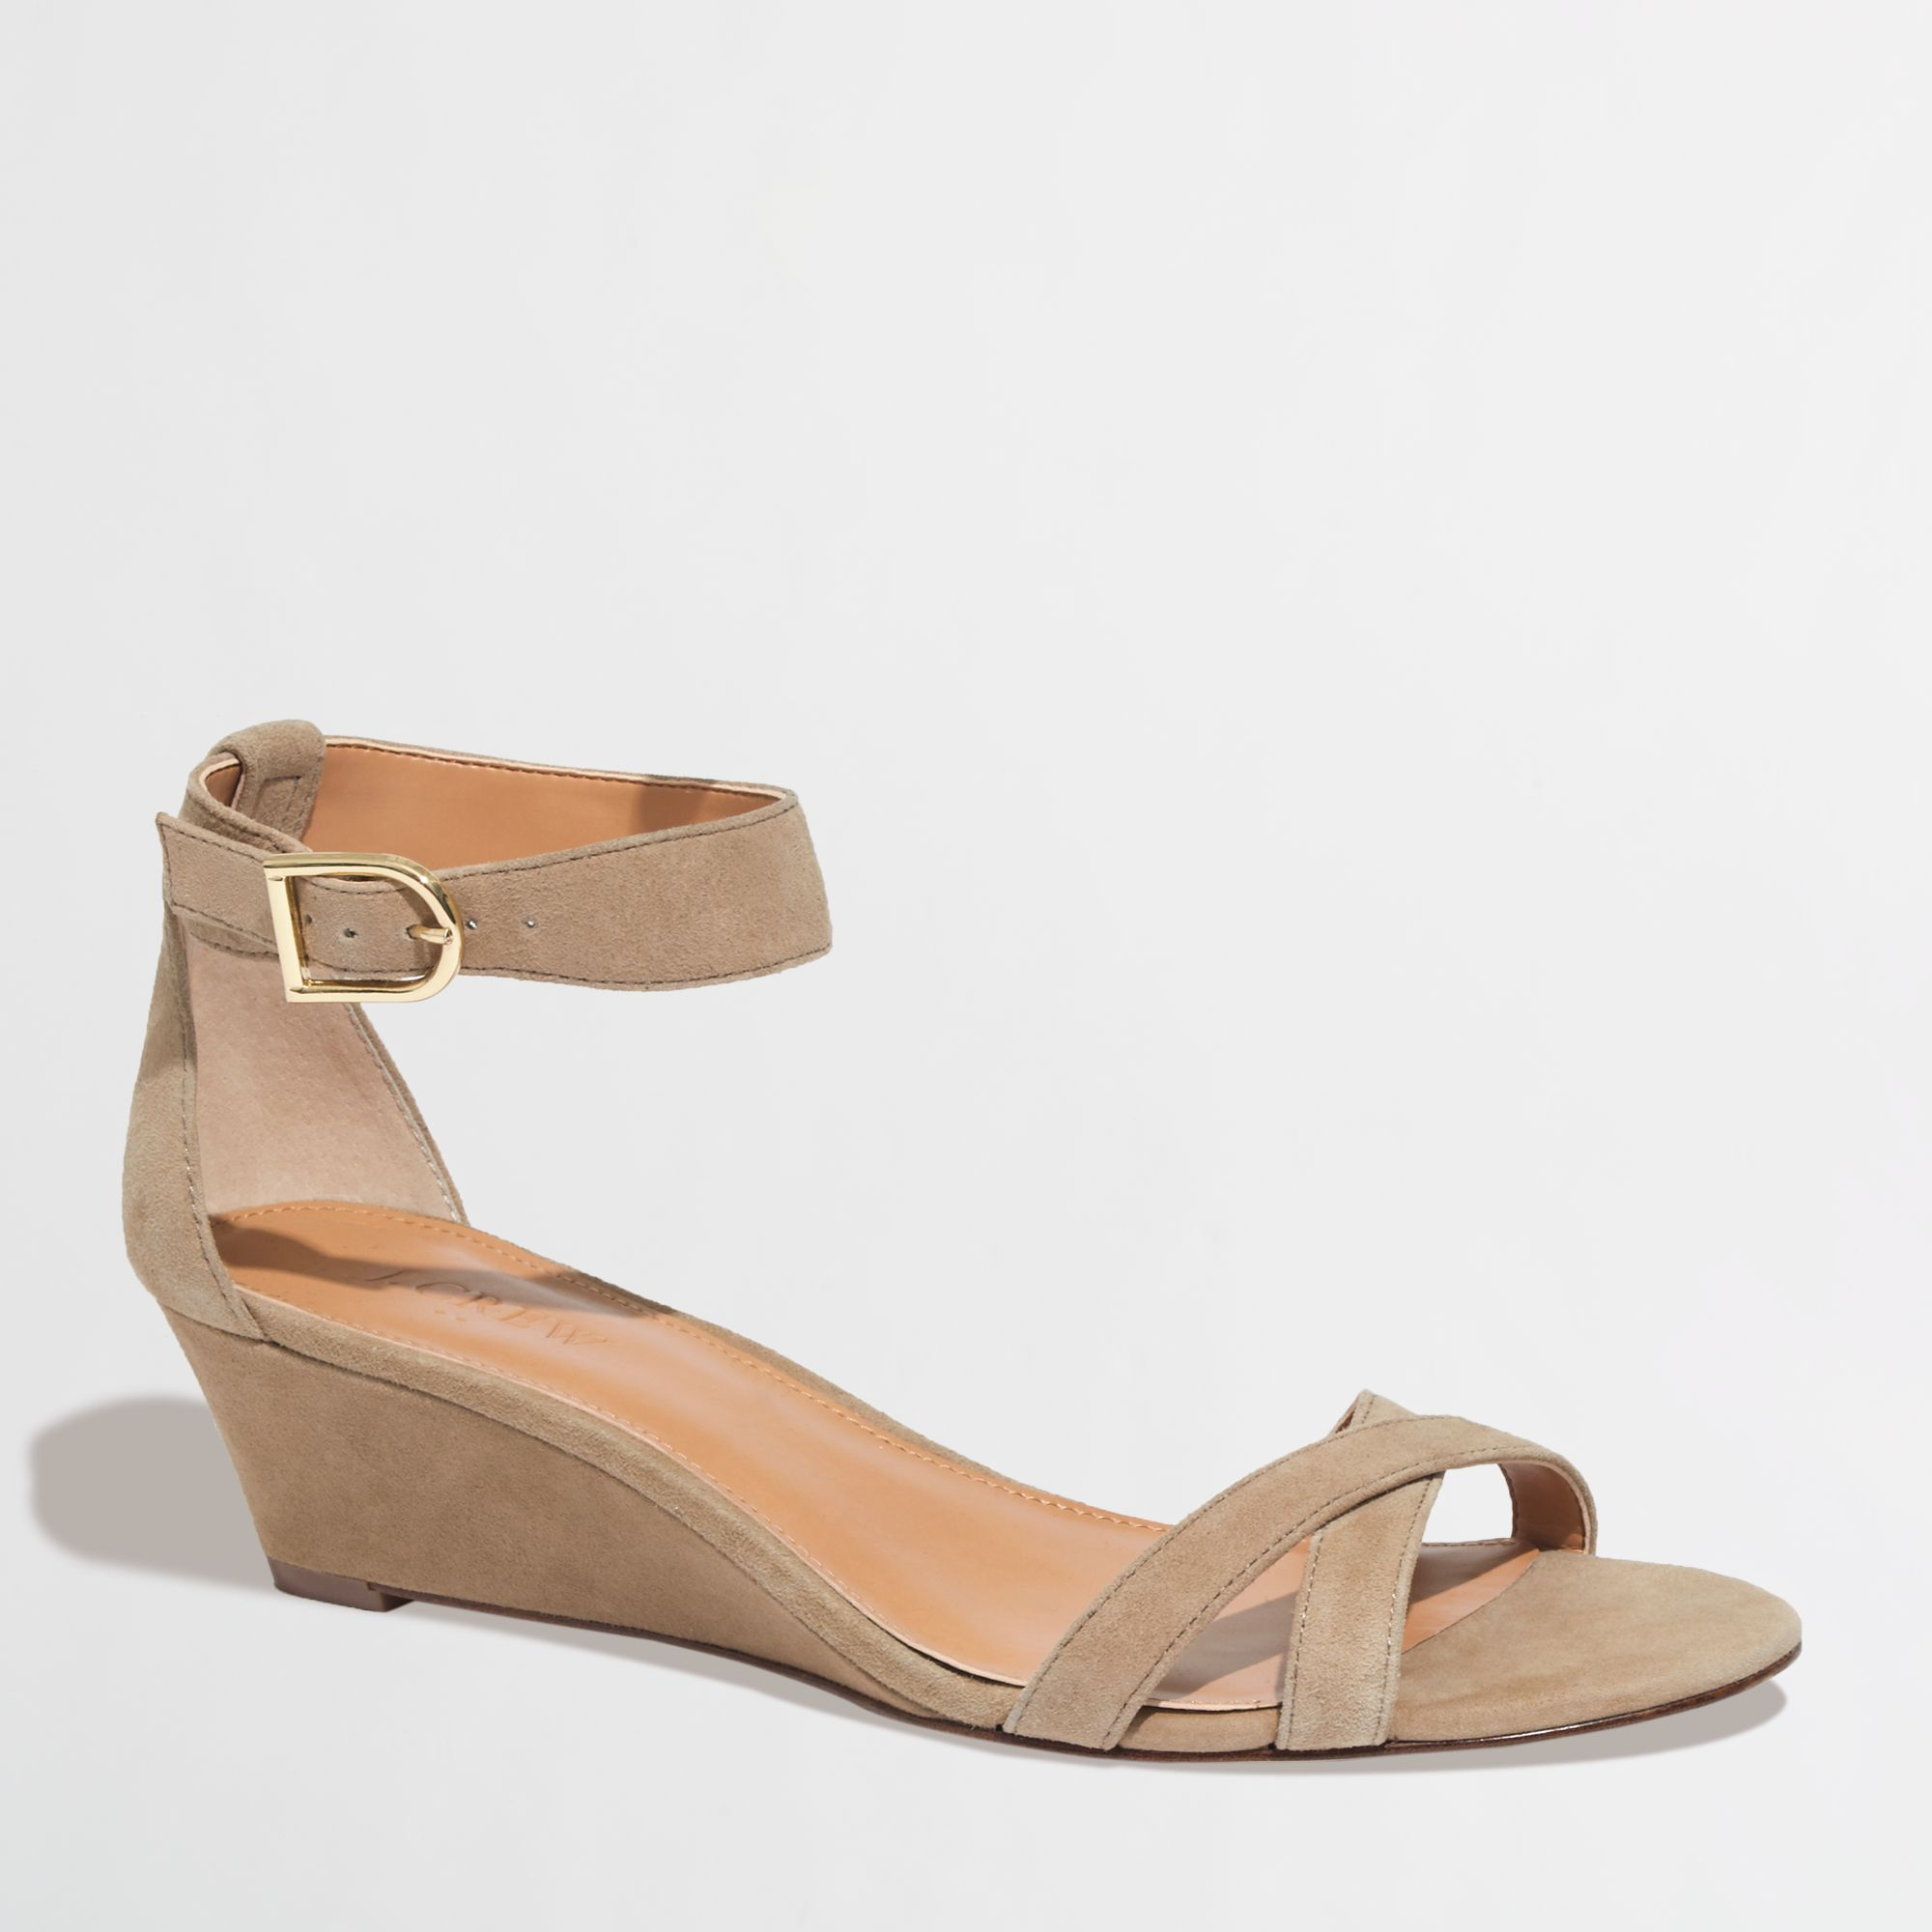 j crew factory demi wedge sandals in lyst